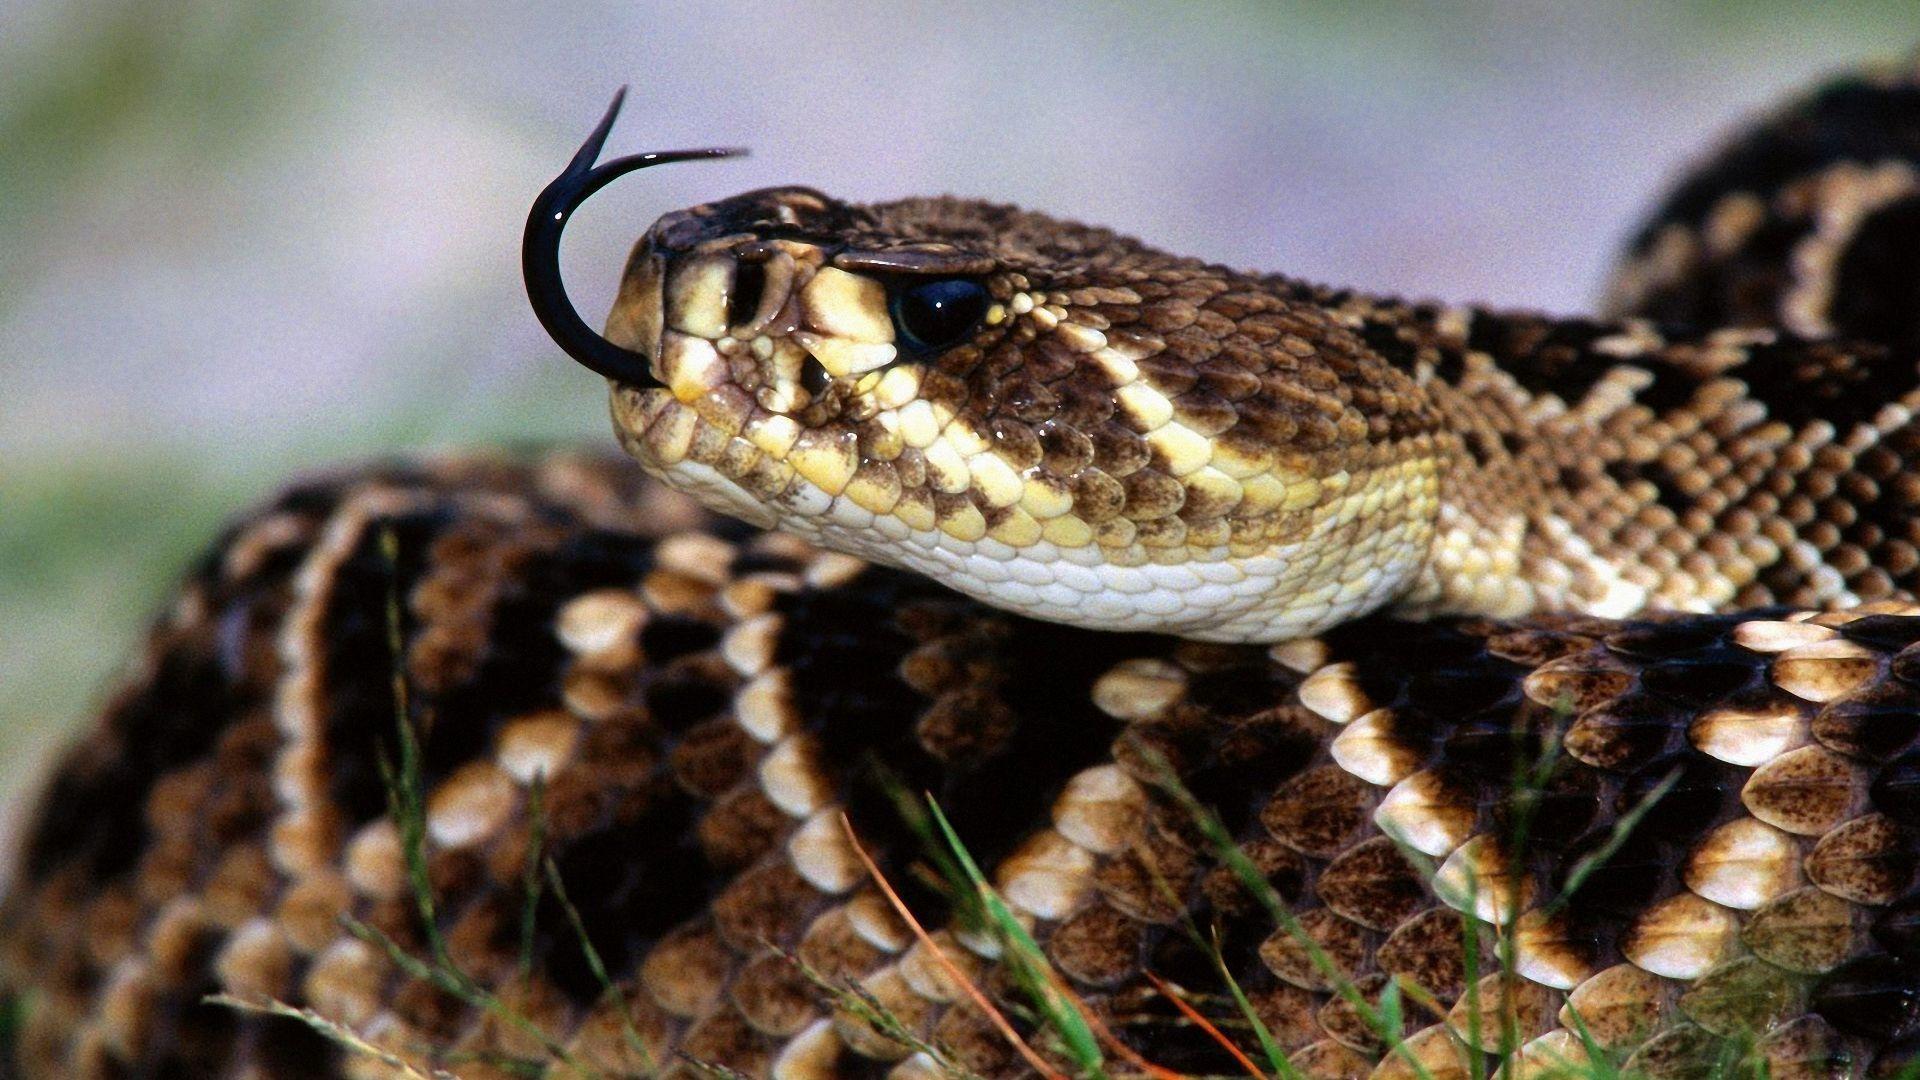 Viper Snake Wallpaper (70+ images)